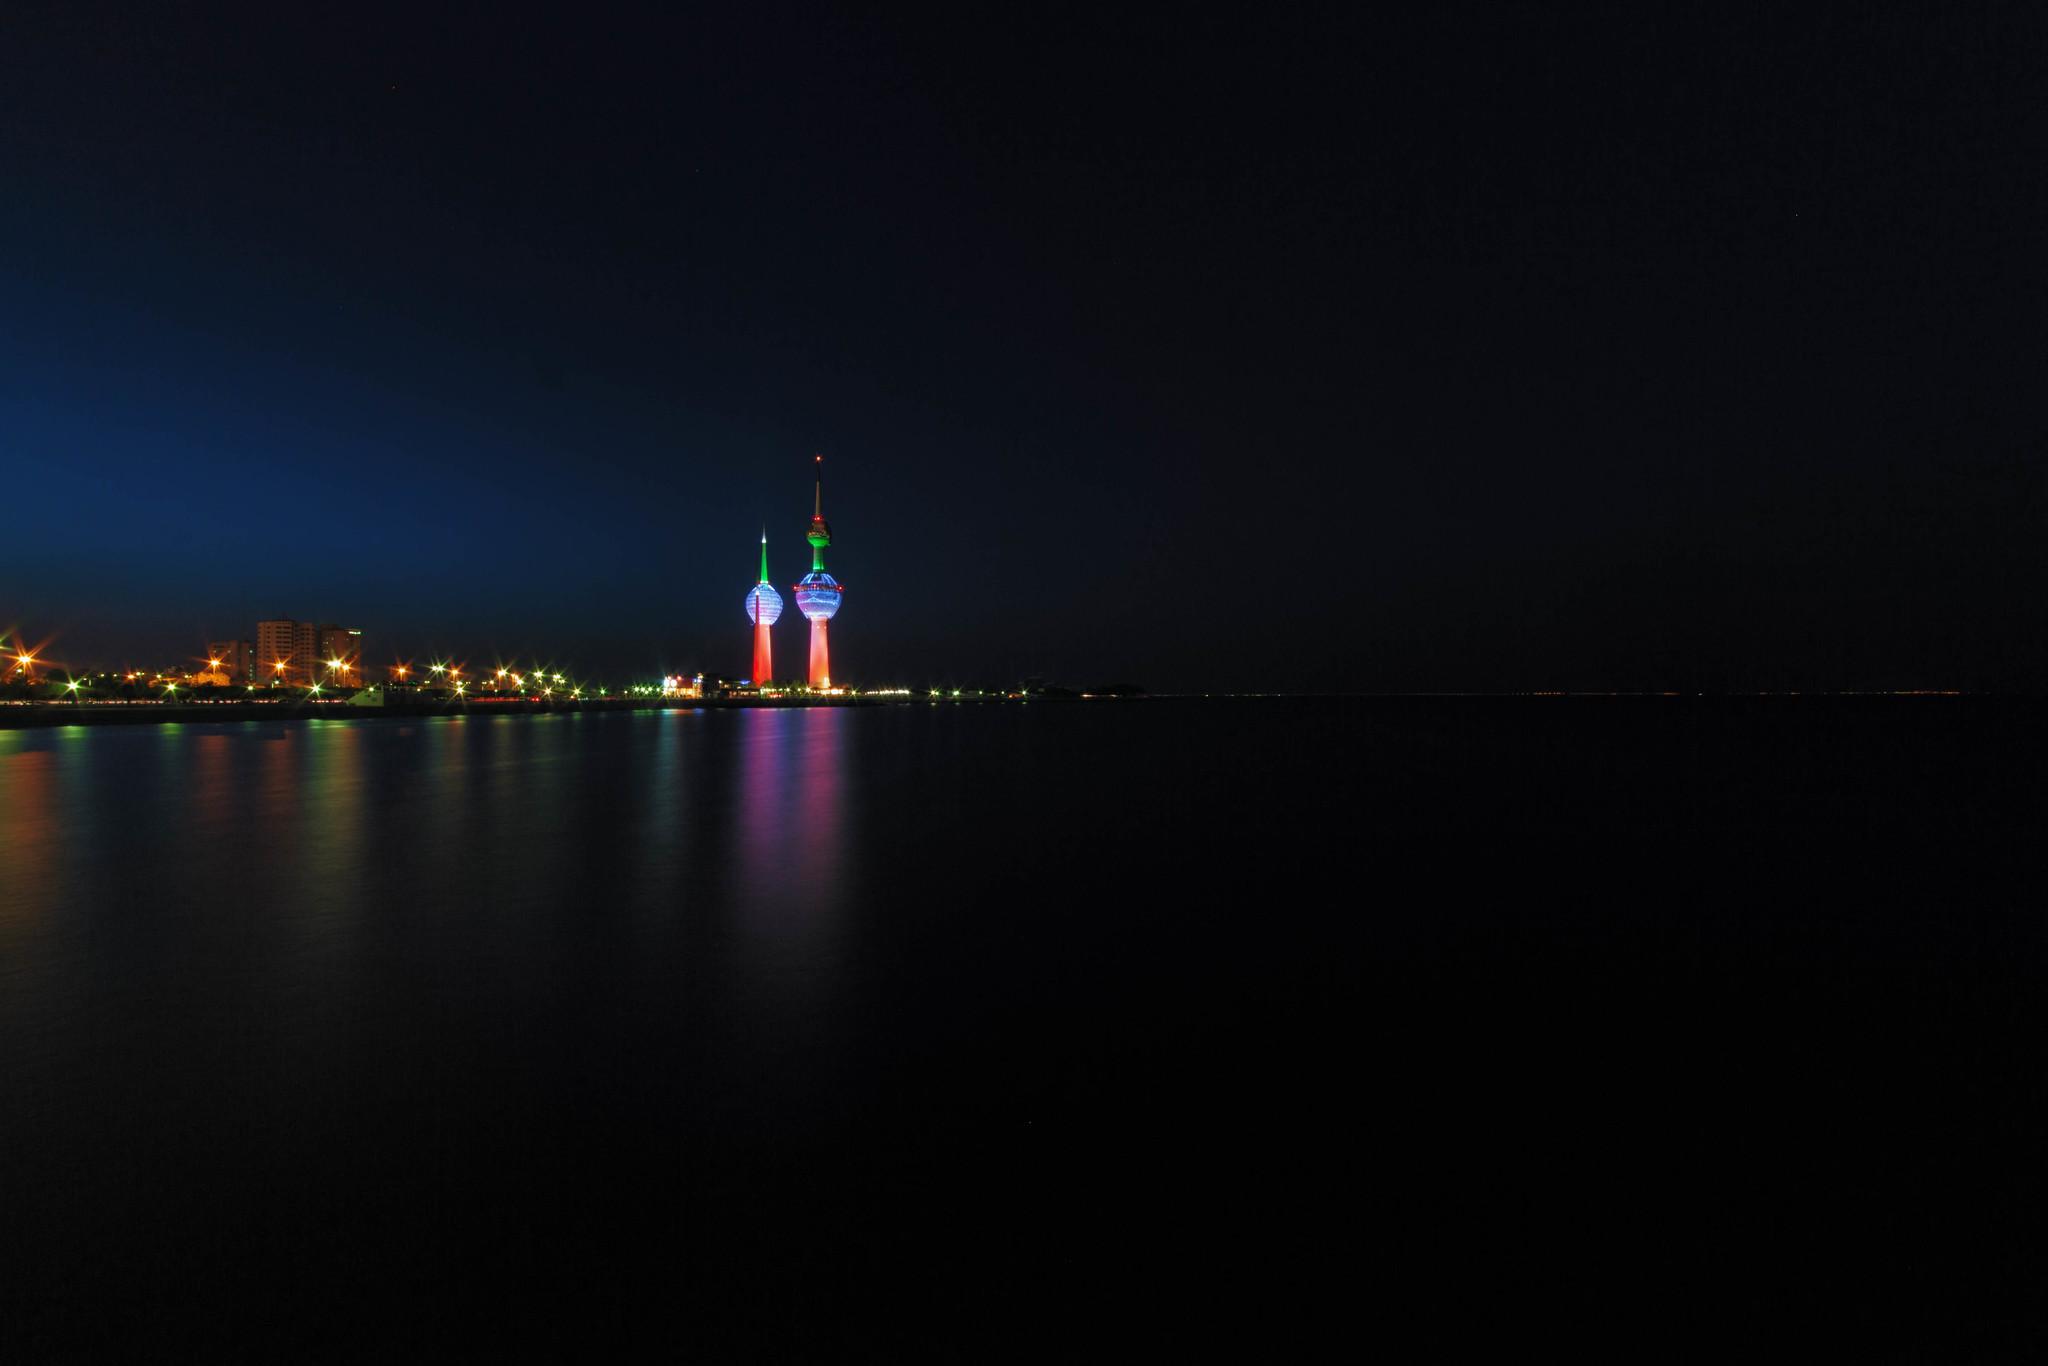 Michael Levine-Clark Follow Kuwait Towers